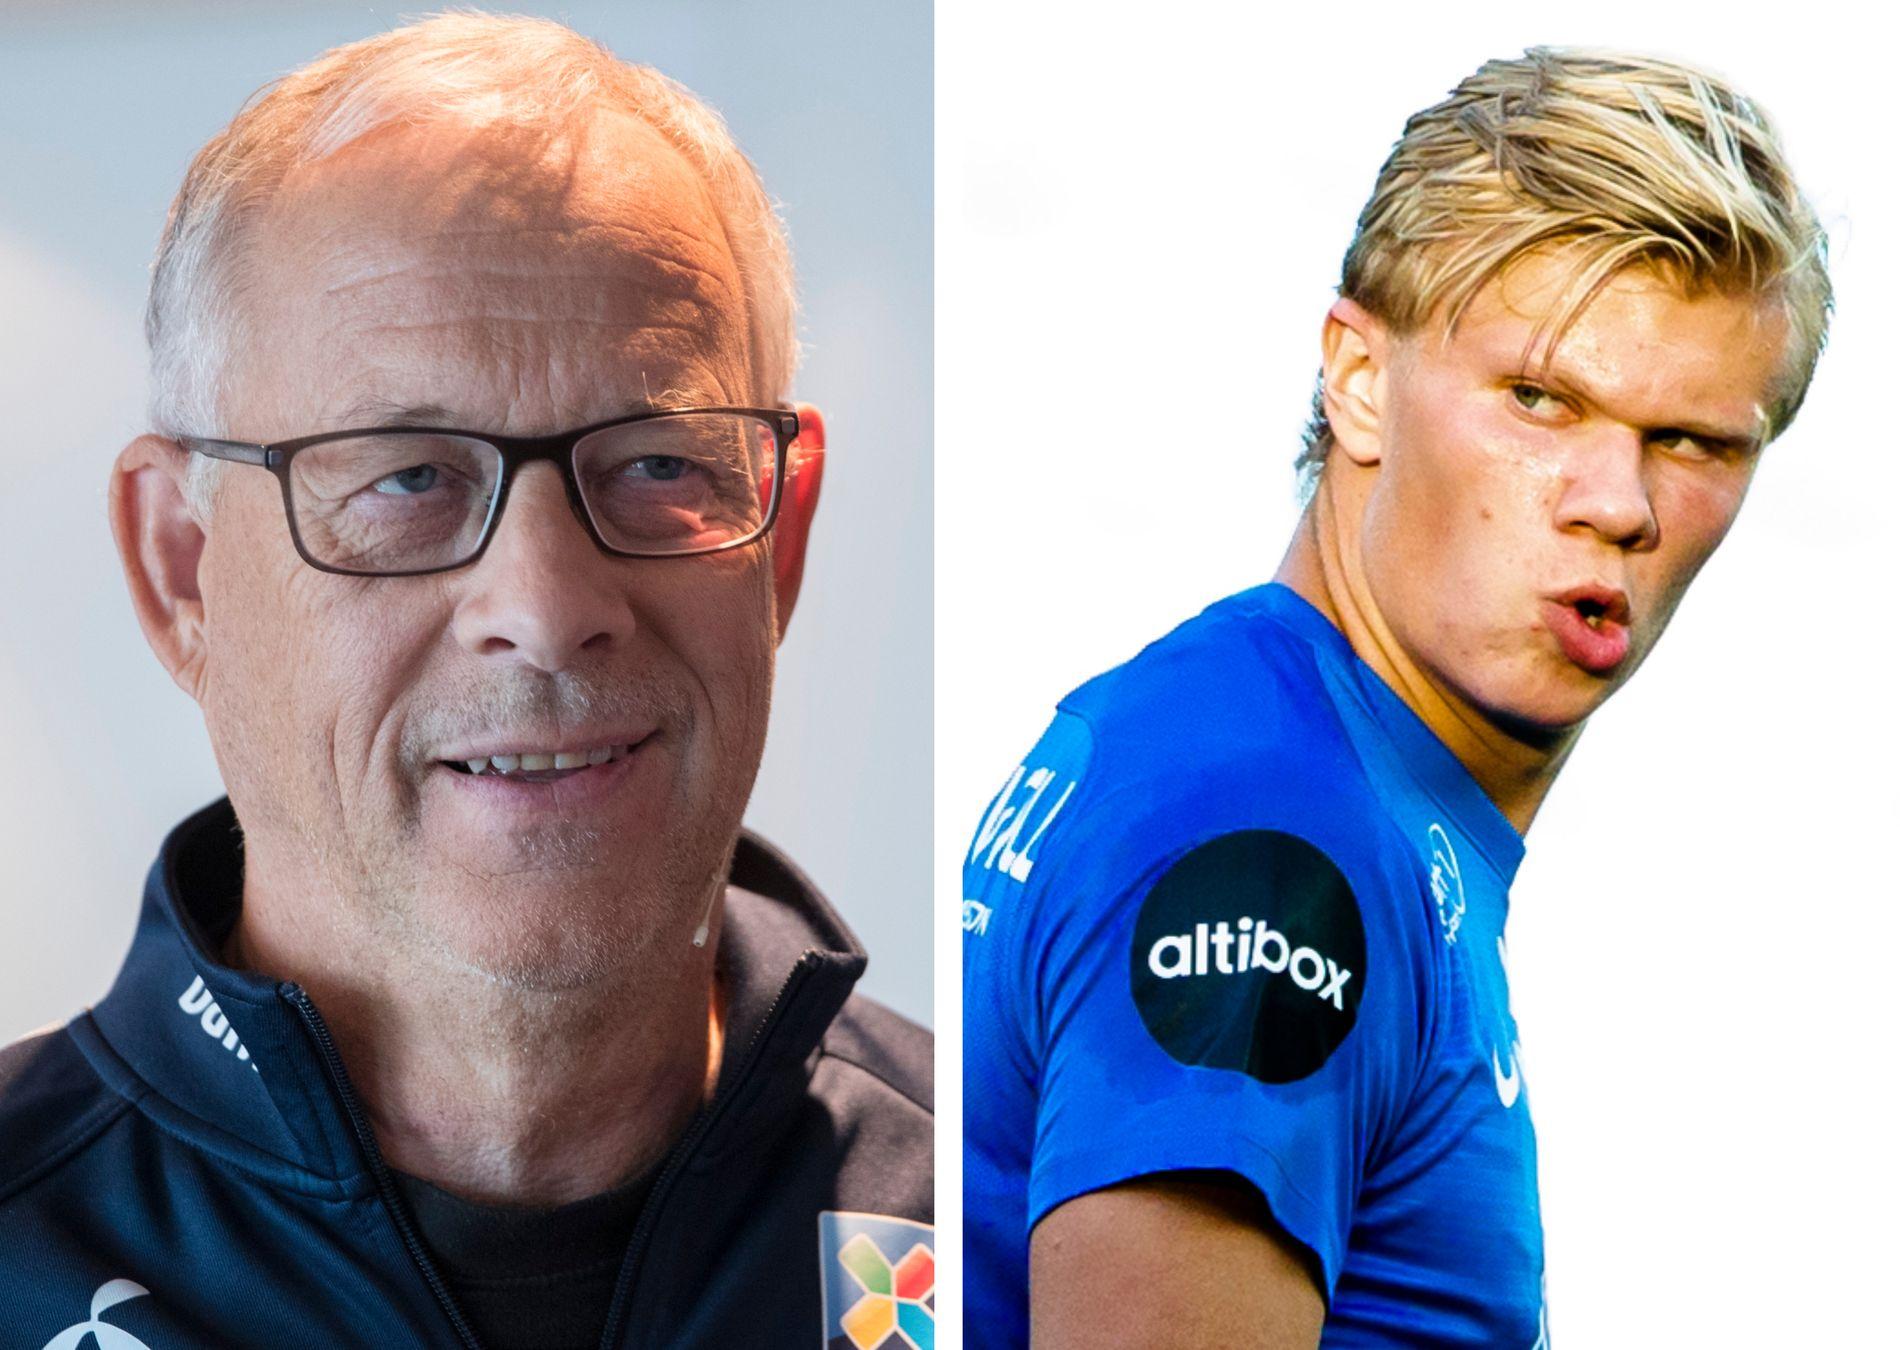 MÅ VENTE: Erling Braut Haaland får ikke plass i Lars Lagerbäcks A-landslagstropp ennå.